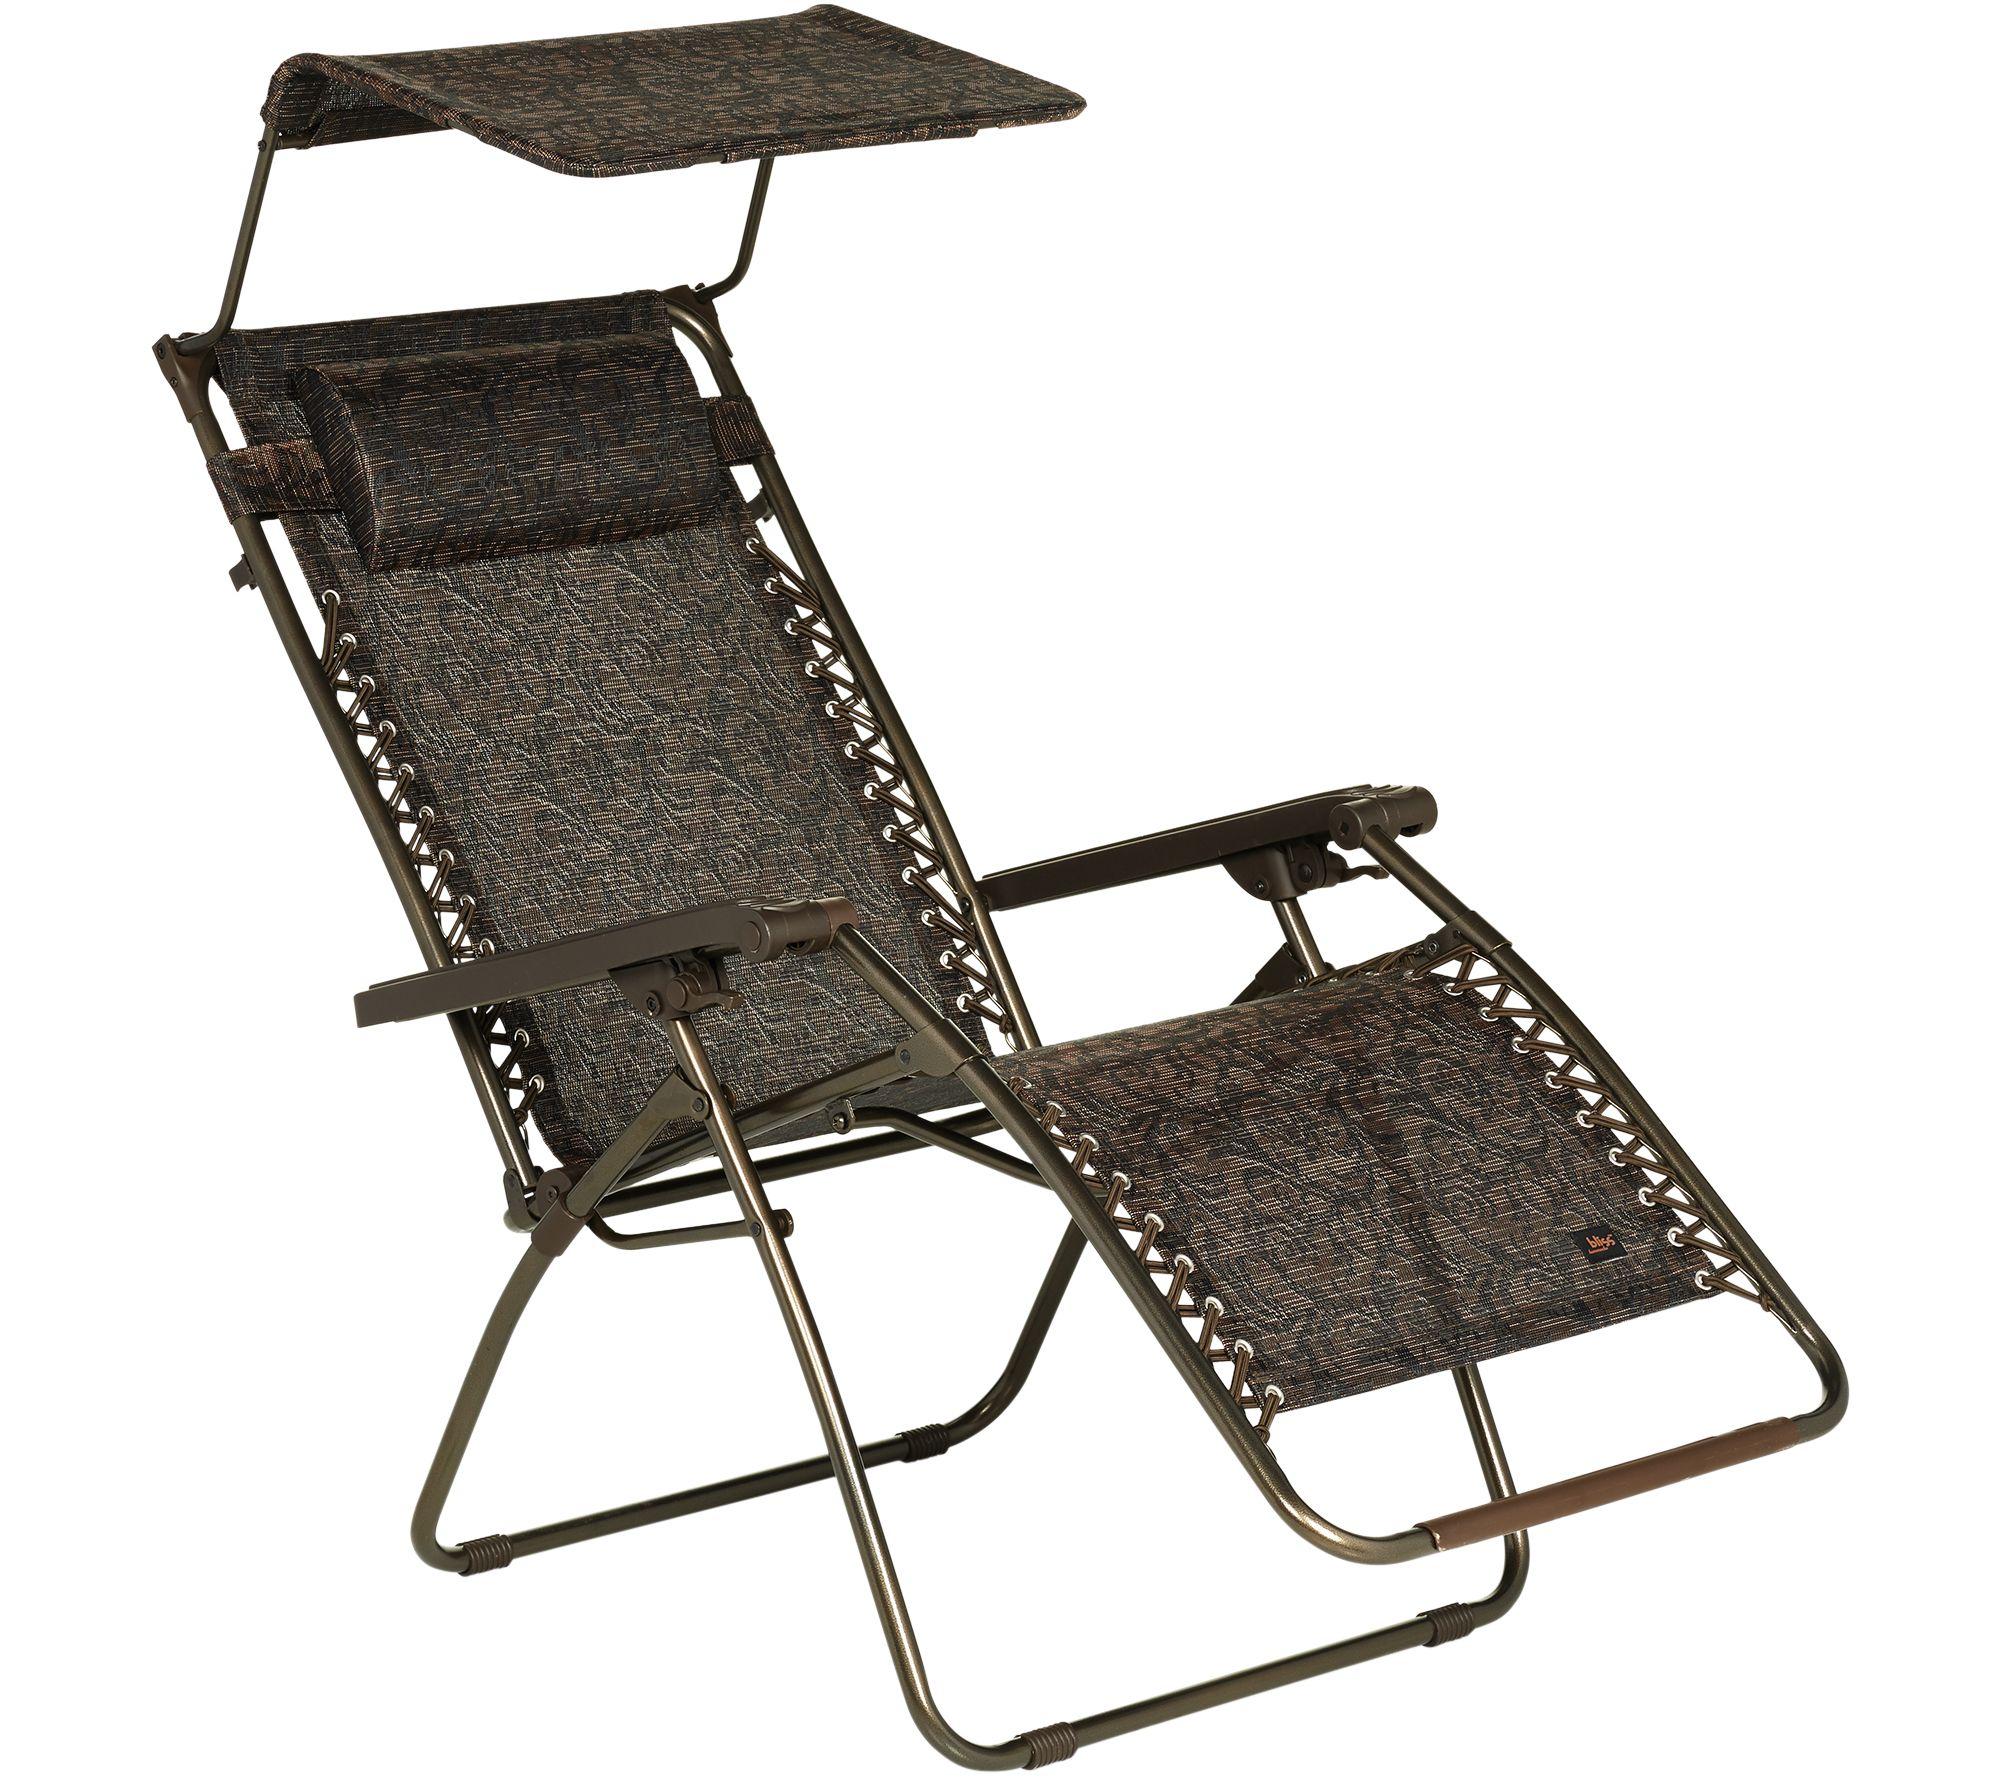 Qvc Bliss Hammocks Premium Gravity Free Reclining Chair